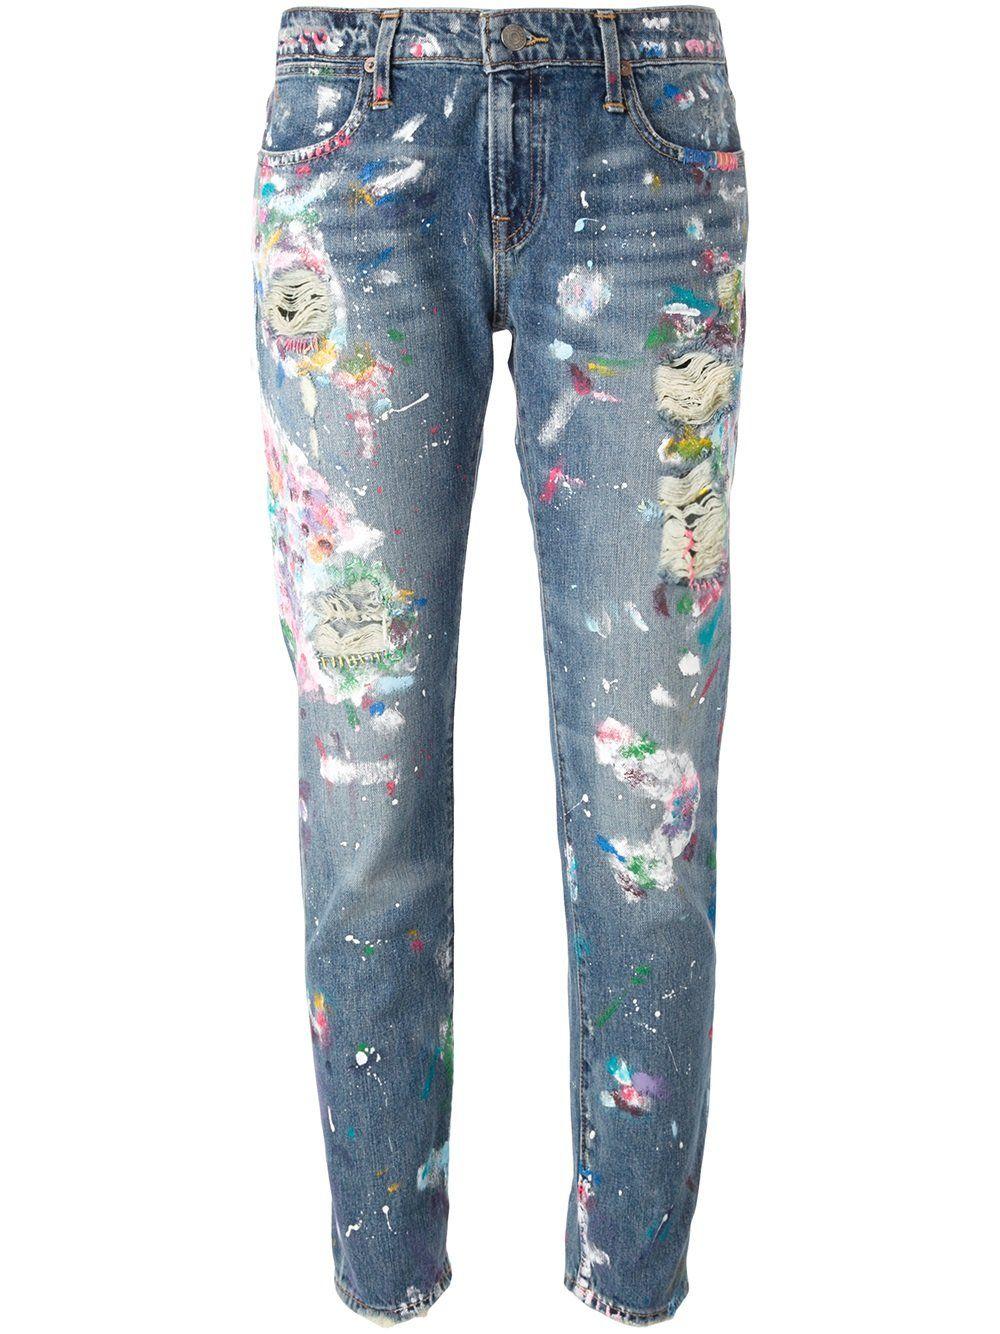 Polo Ralph Lauren distressed paint splatter jeans   Tees   Jeans ... 09ab889917b